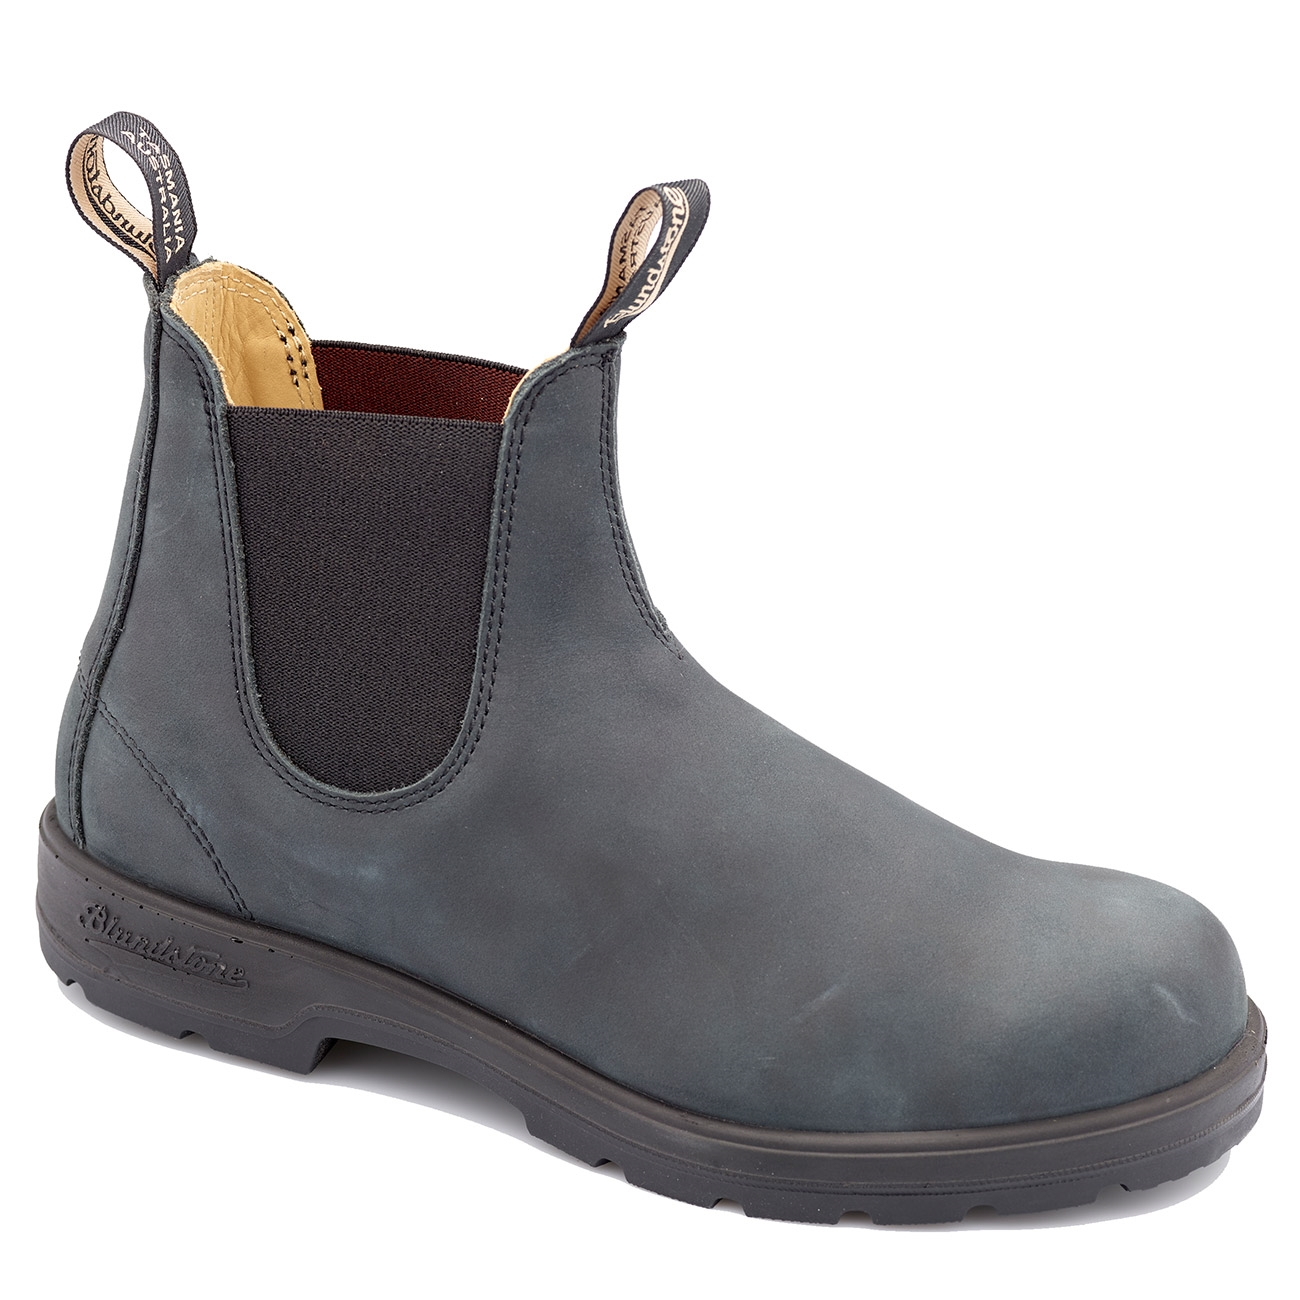 Blundstone Classic Comfort Boot Rustic Black